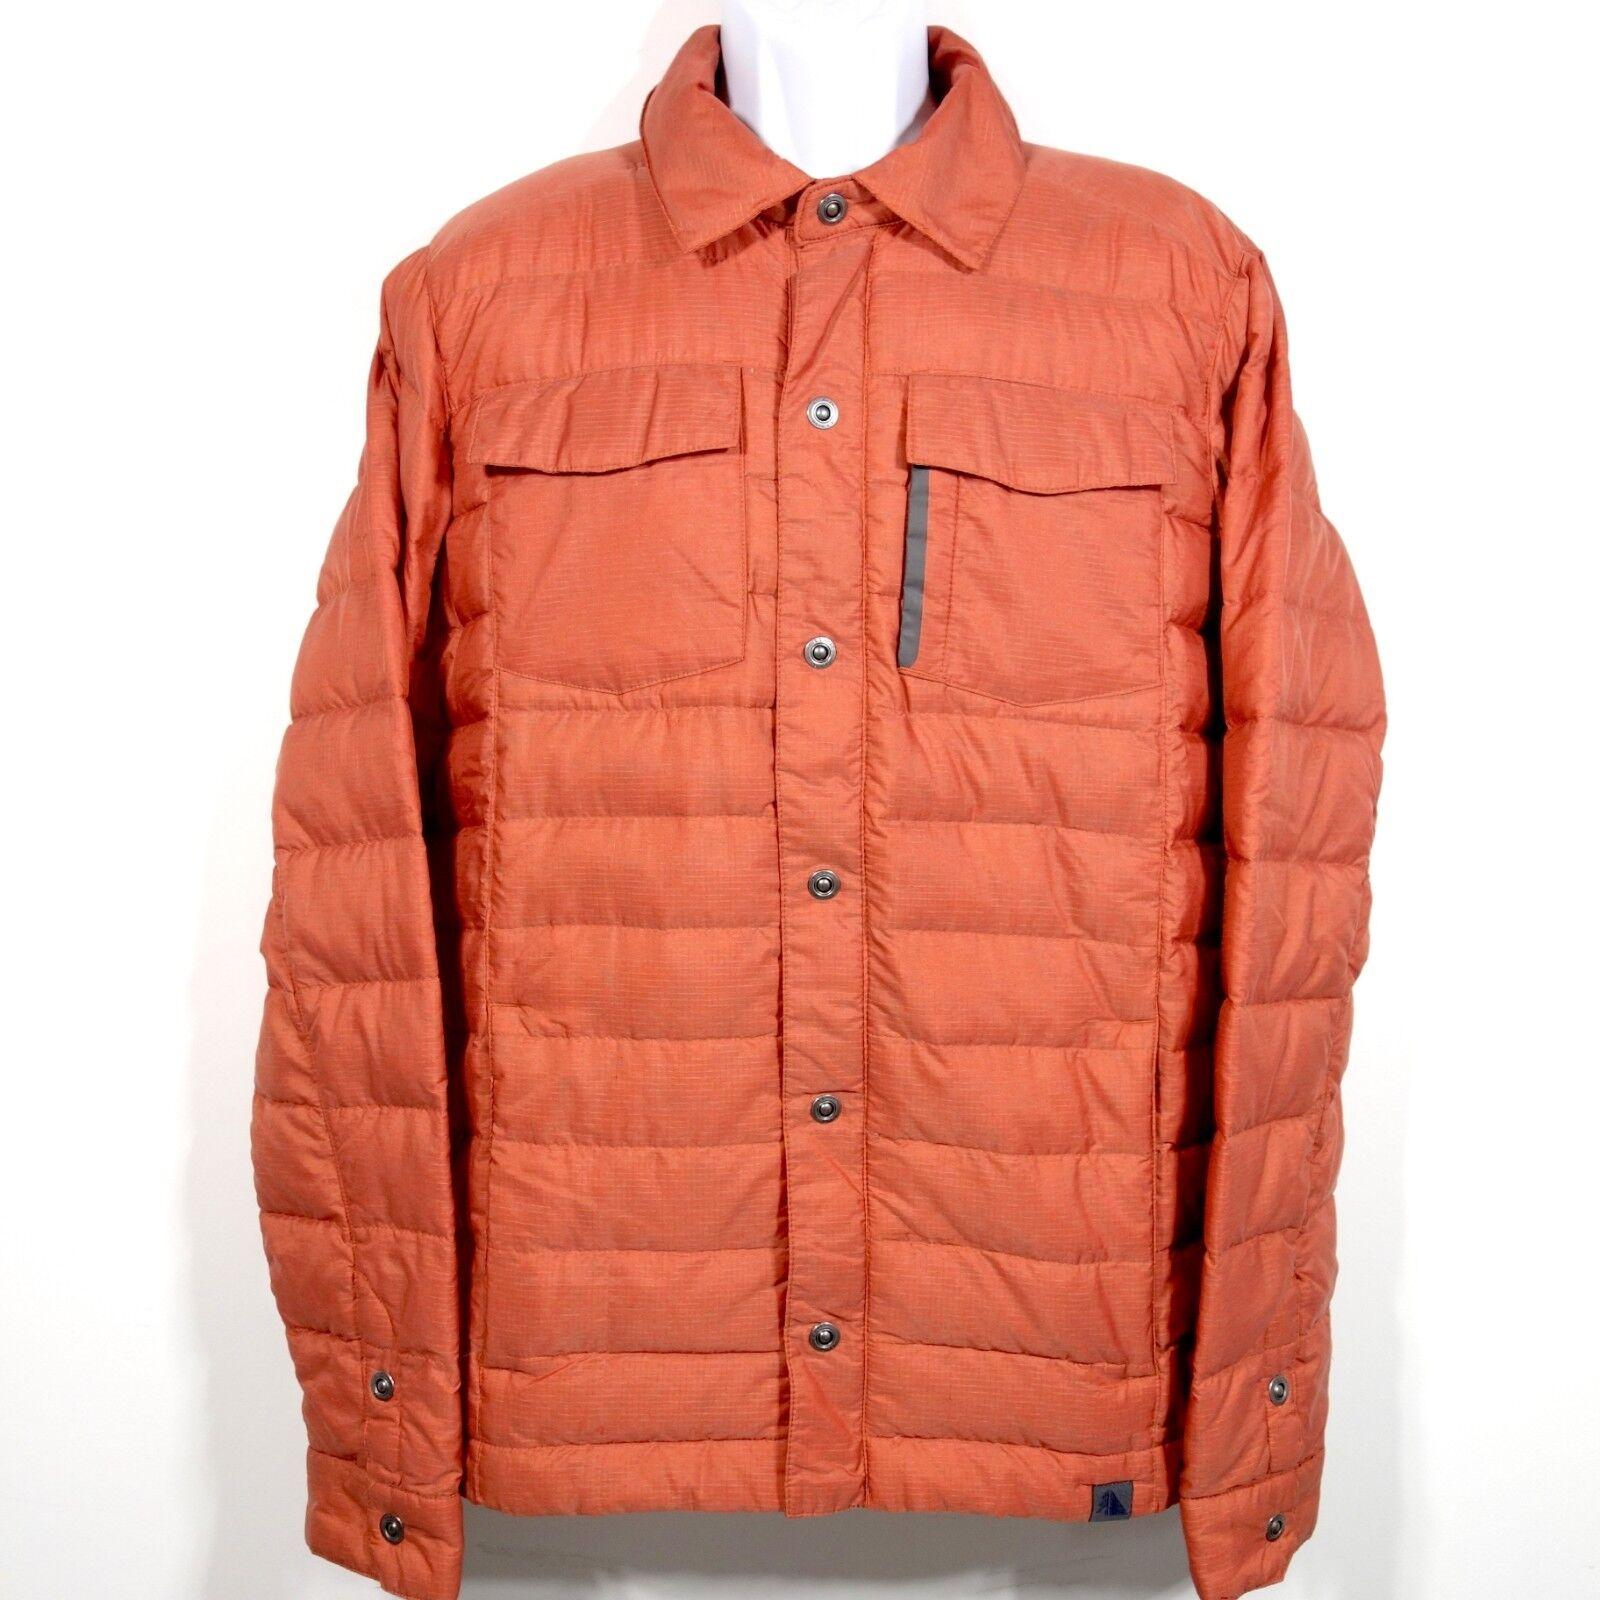 Ll Bean  downtek plumas de ganso NYLON Puffer chaqueta de hombre medio alto Mt ligero  n ° 1 en línea